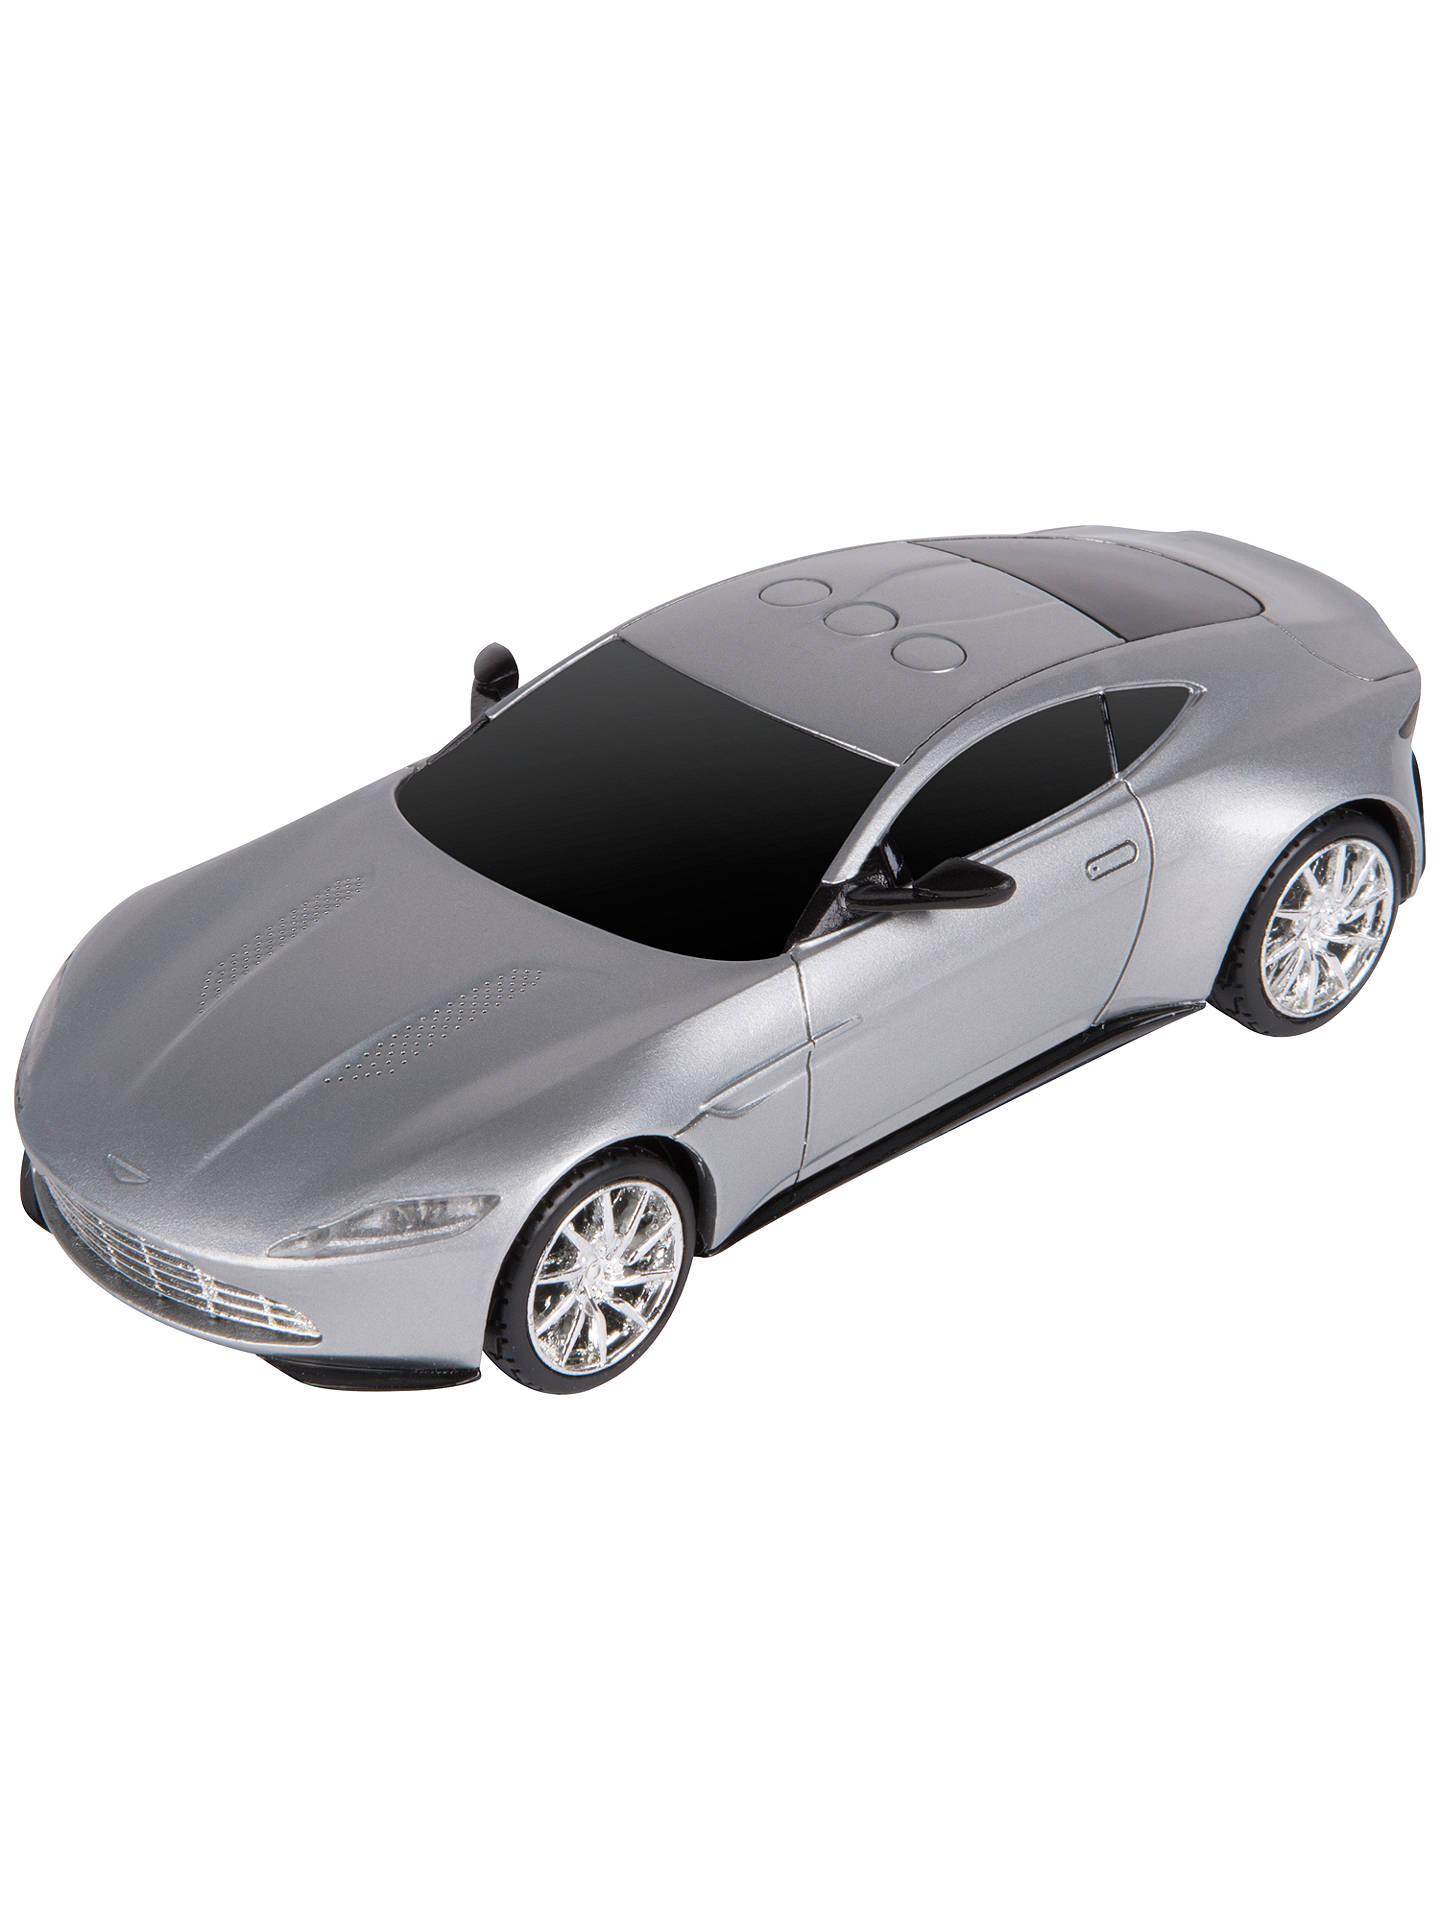 James Bond Aston Martin Db10 Toy Car At John Lewis Partners